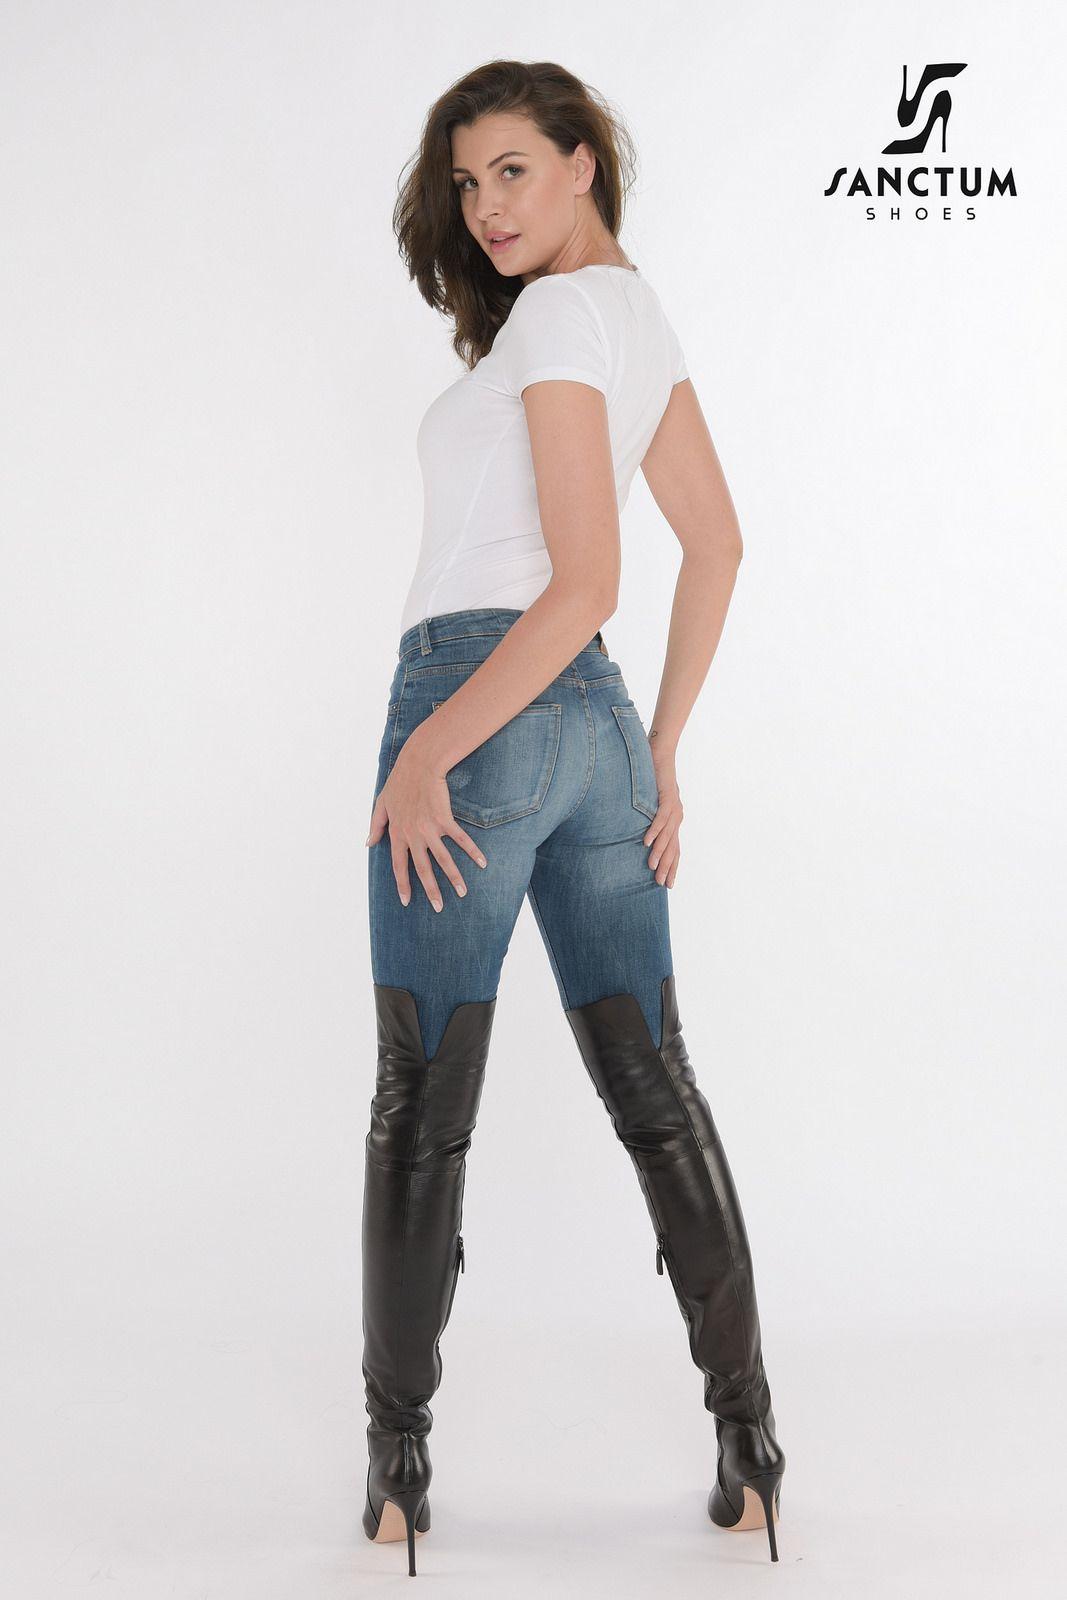 olga sanctum shoes nl italian leather leather and